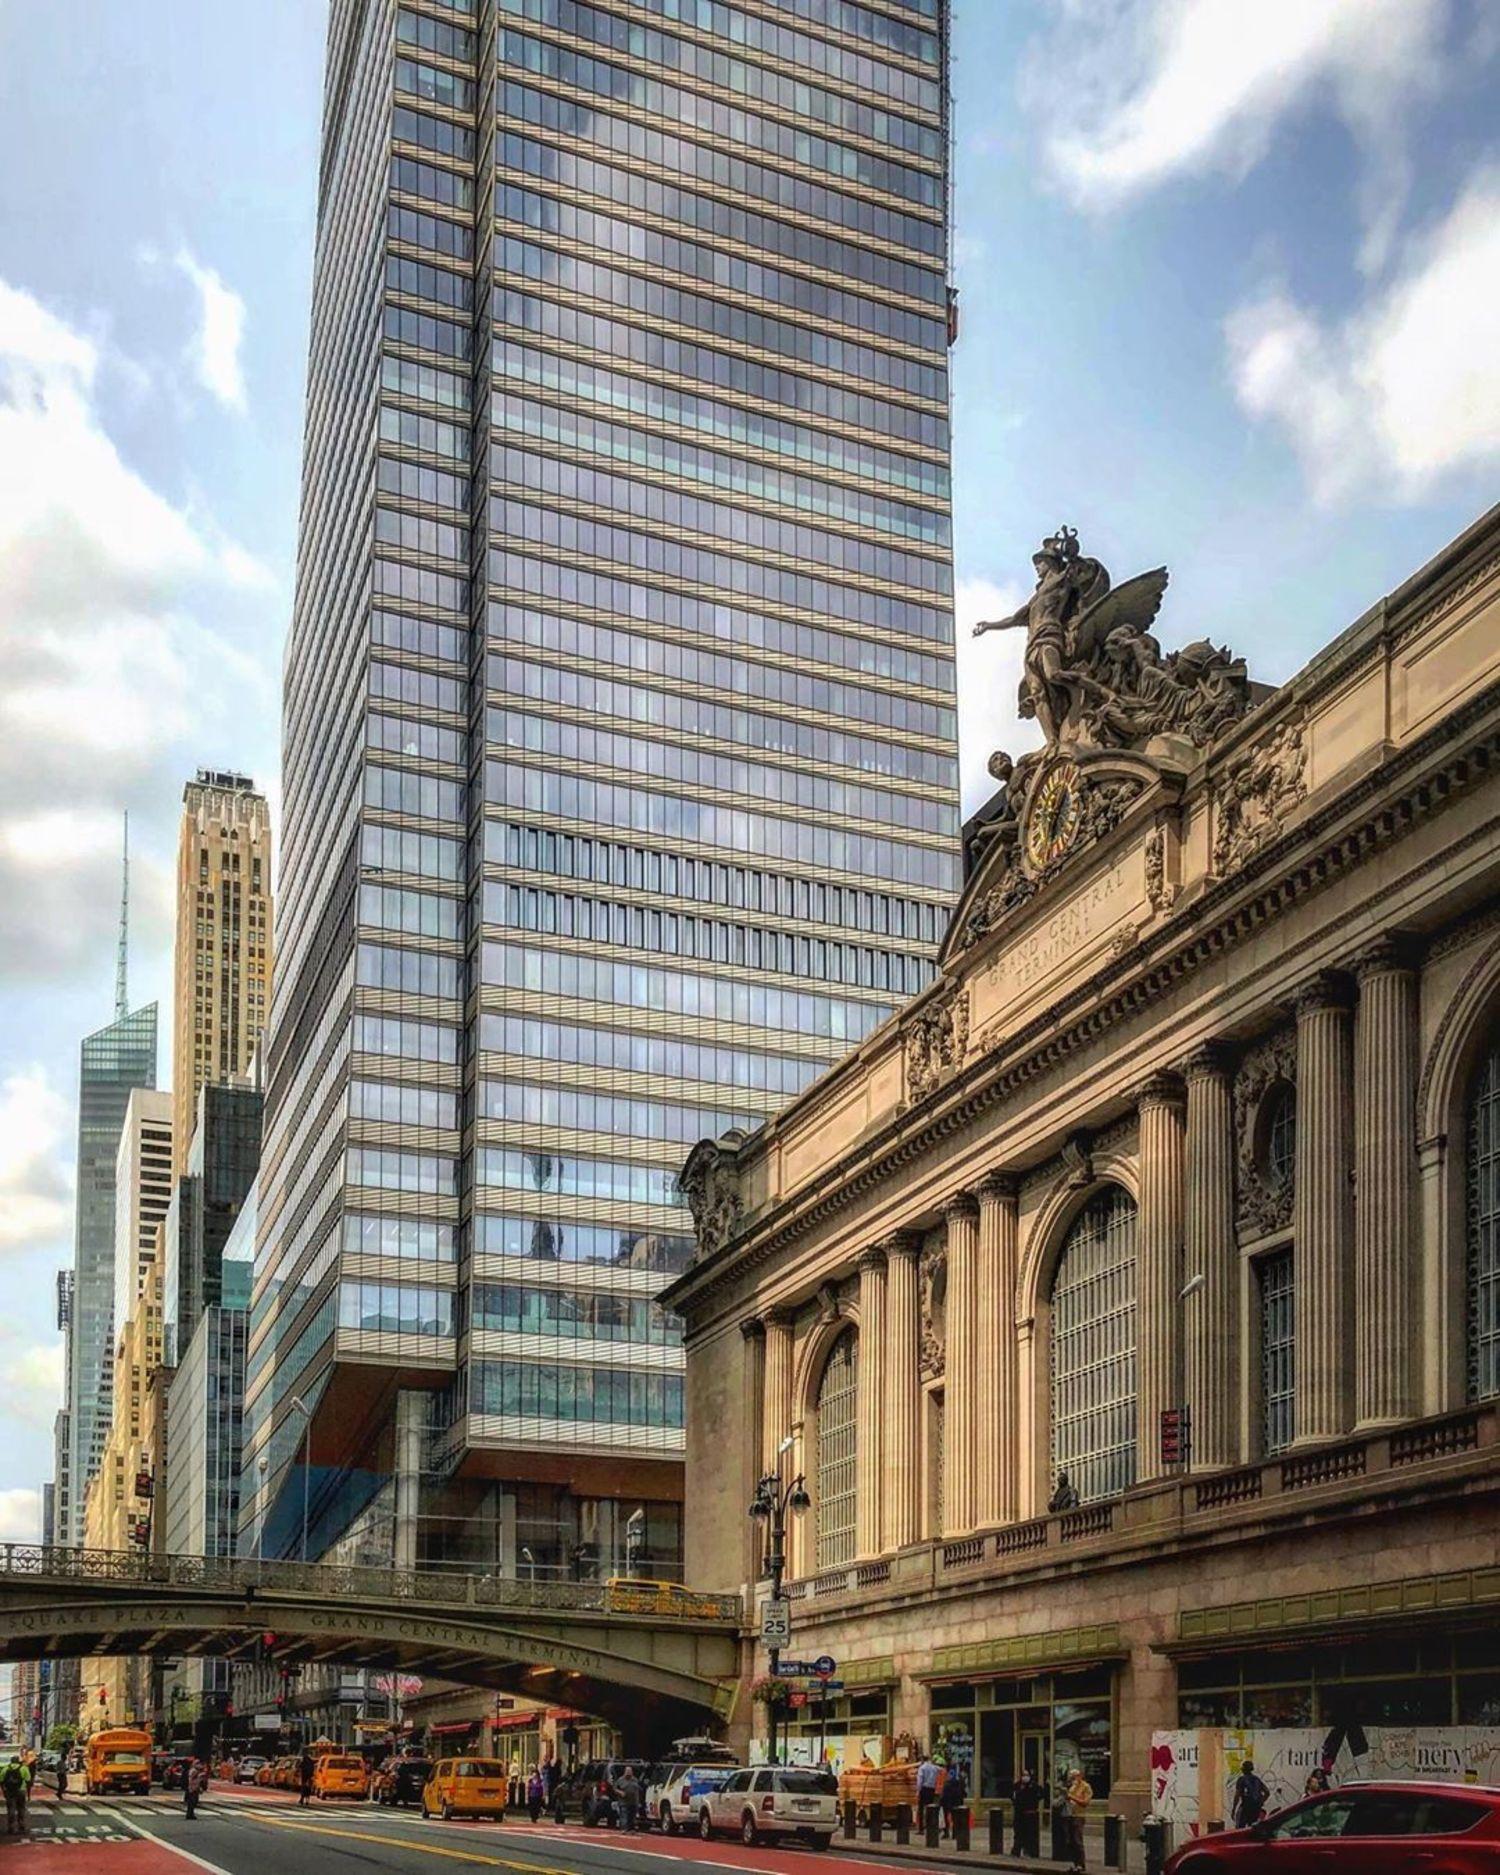 Grand Central Terminal, 42nd Street, Manhattan